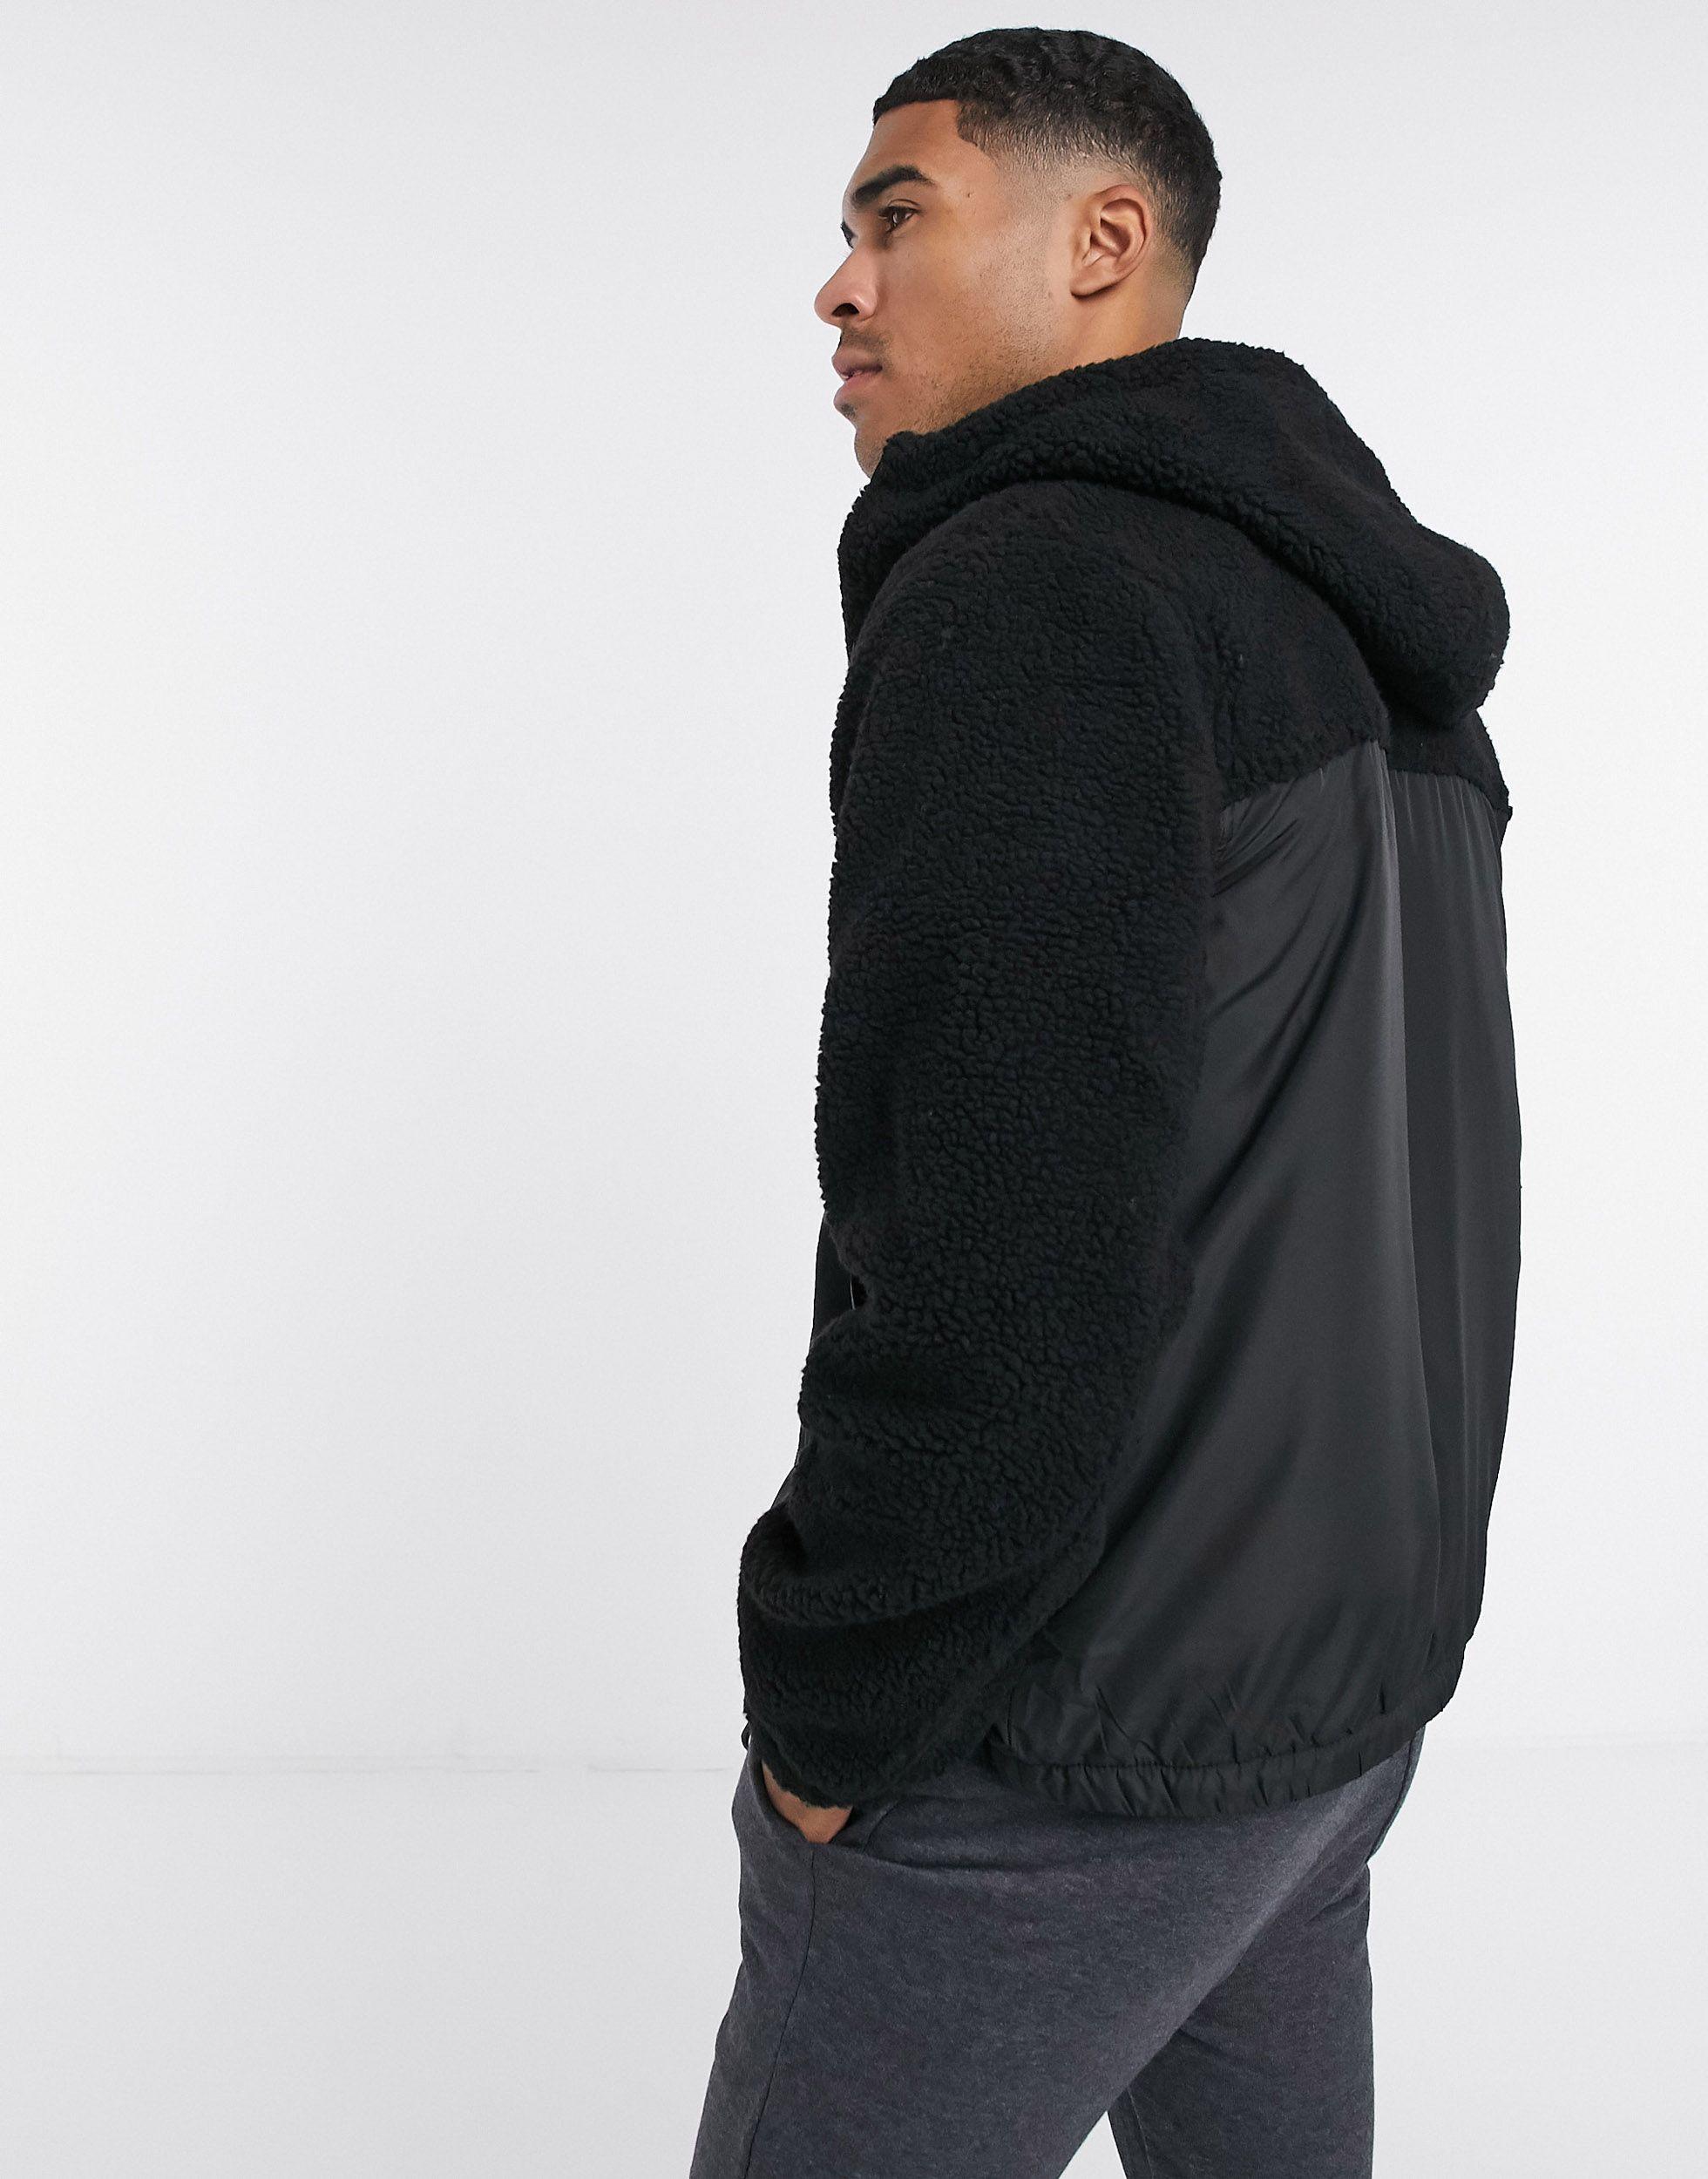 Mens Brave Soul BORG HOODIE Sherpa FLEECE lined Zip Up Hooded Coat Track Jackets